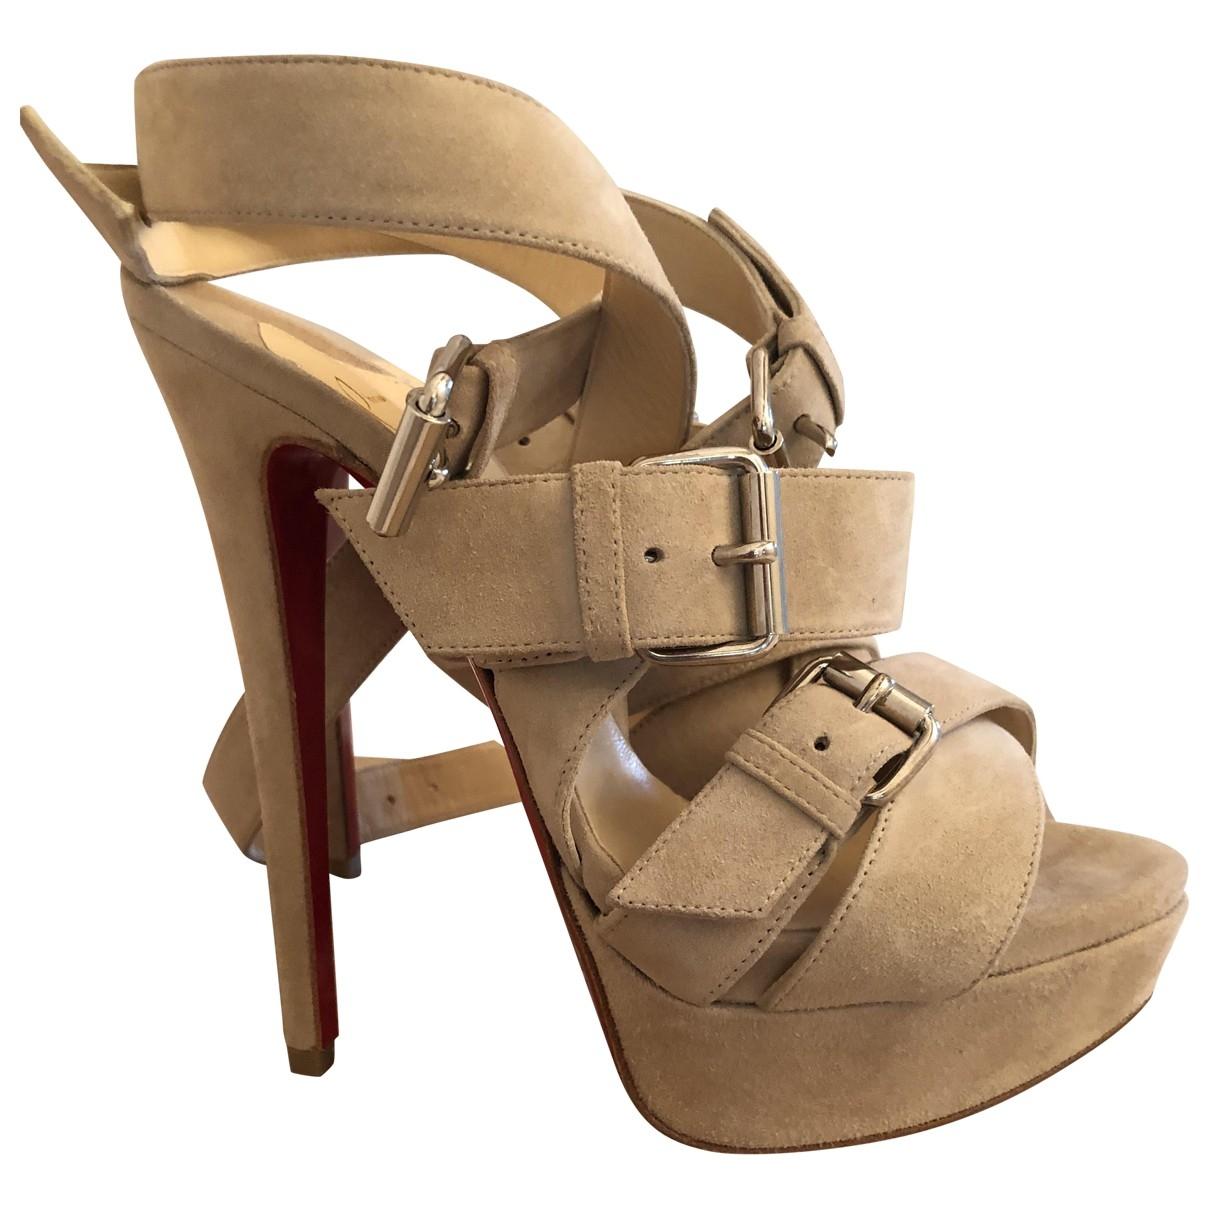 Christian Louboutin \N Beige Suede Sandals for Women 37 EU